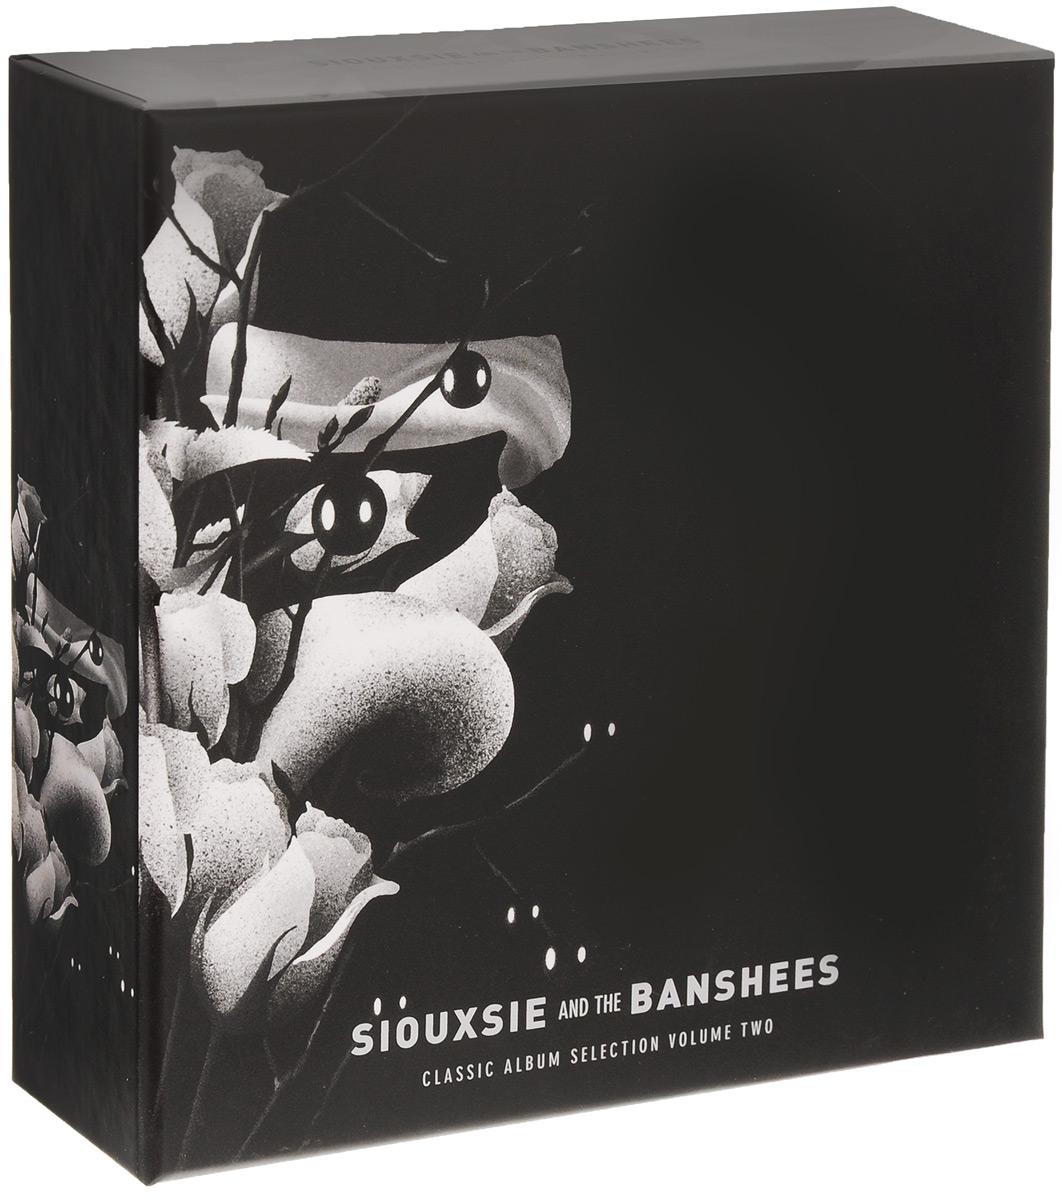 Siouxsie And The Banshees Siouxsie And The Banshees. Classic Album Selection. Volume 2 (6 CD) подставка под цветы etagerca leontina низкая st9303etg l